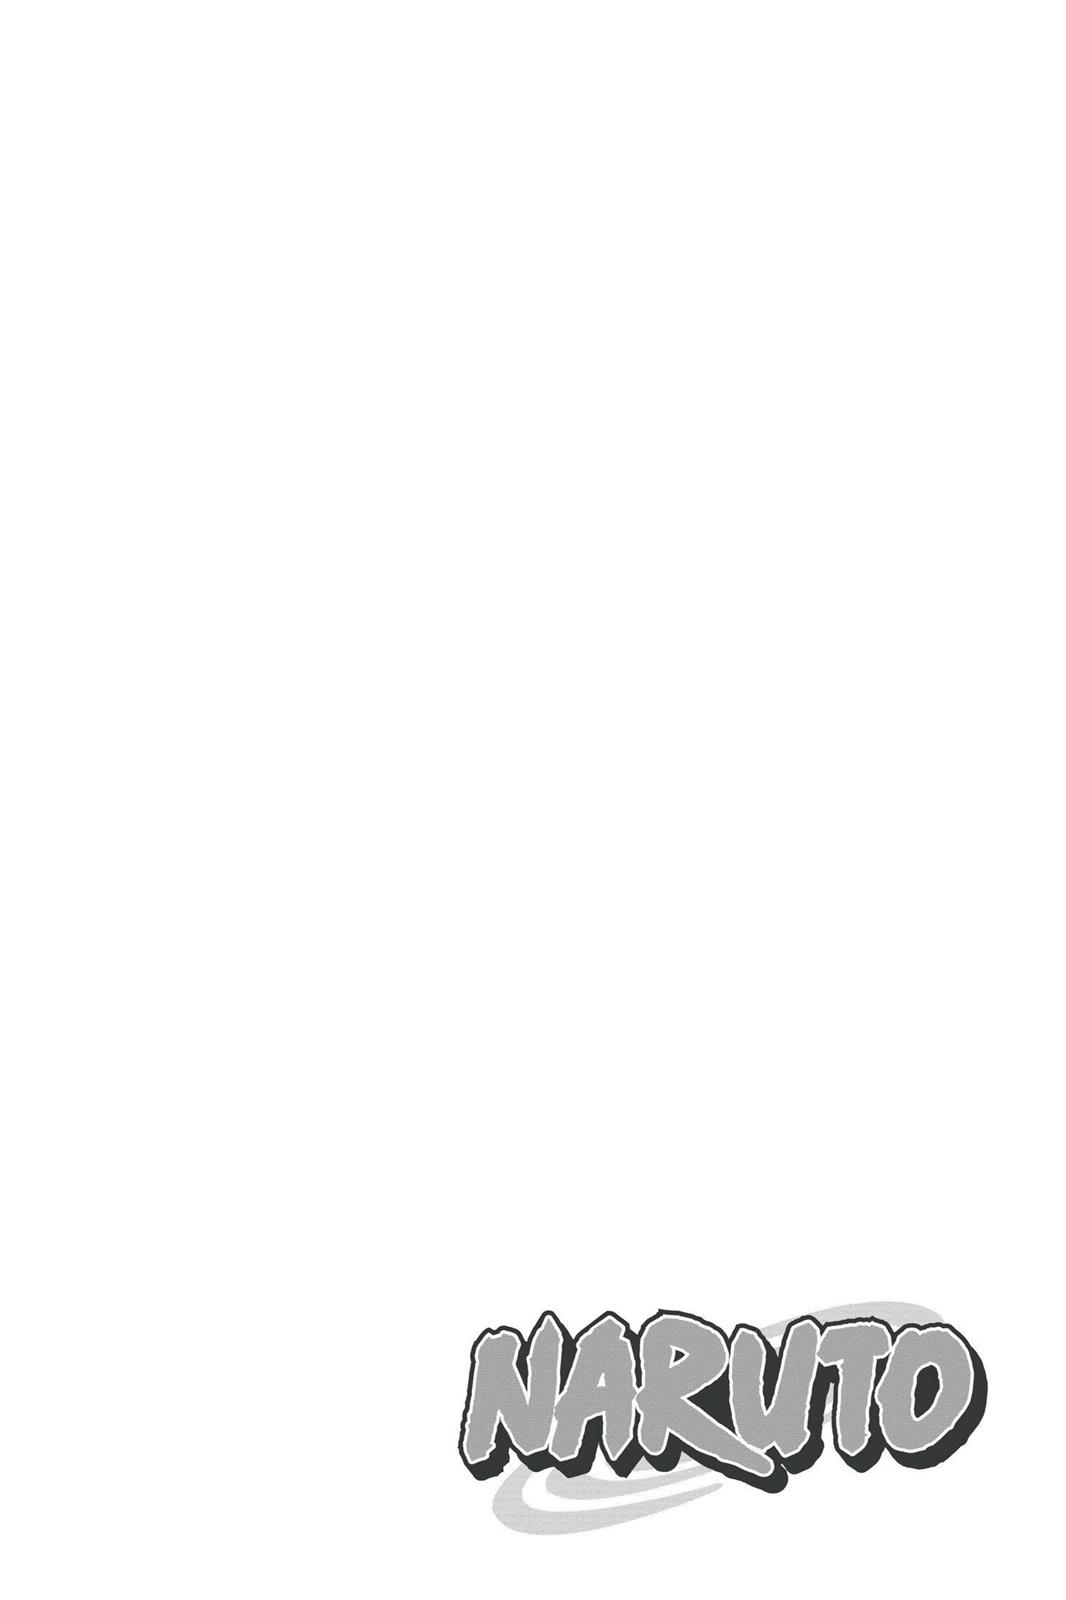 Naruto, Chapter 348 image 018